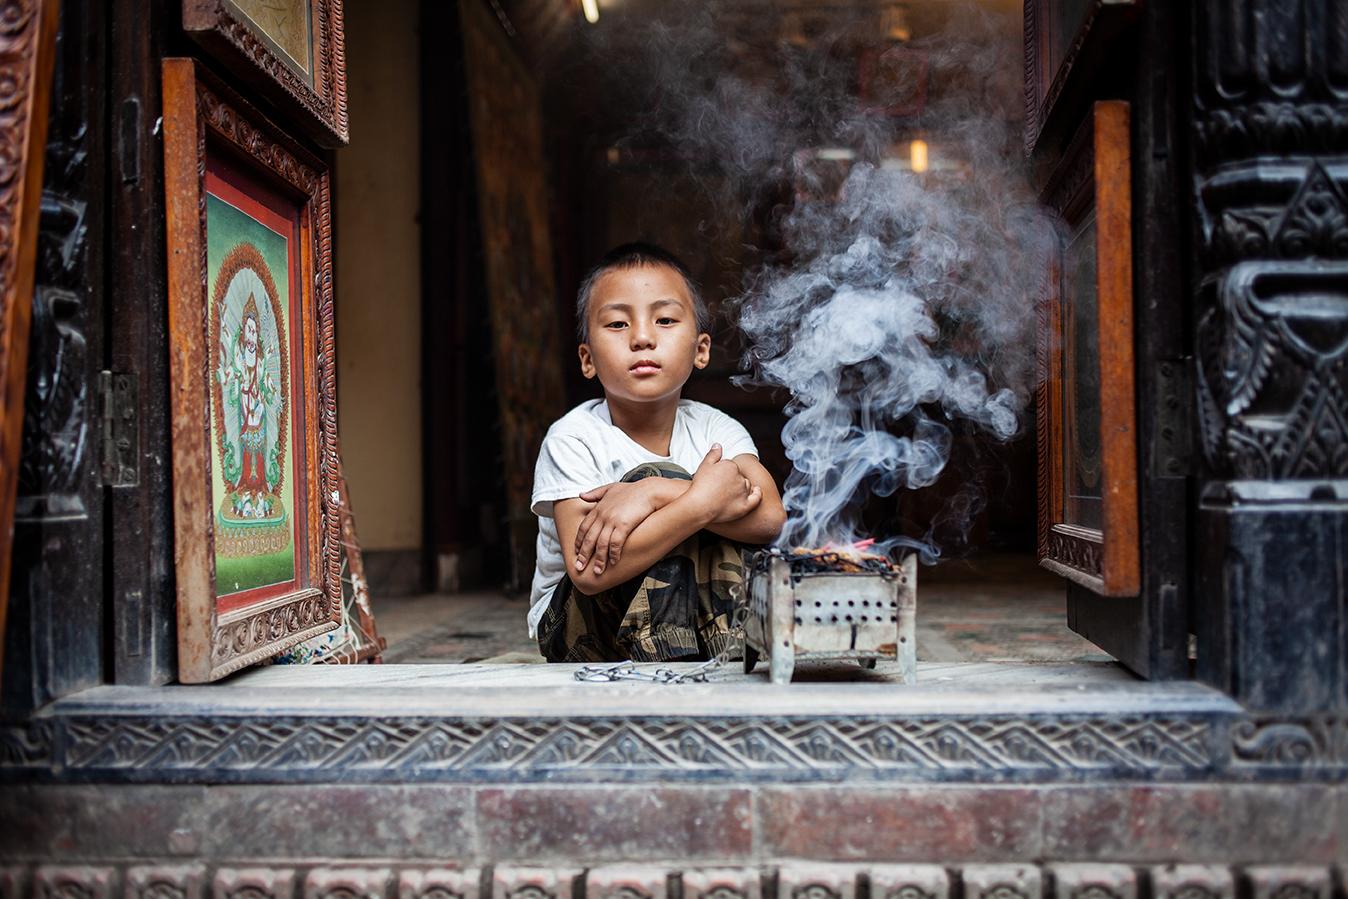 JUNGE |NEPAL